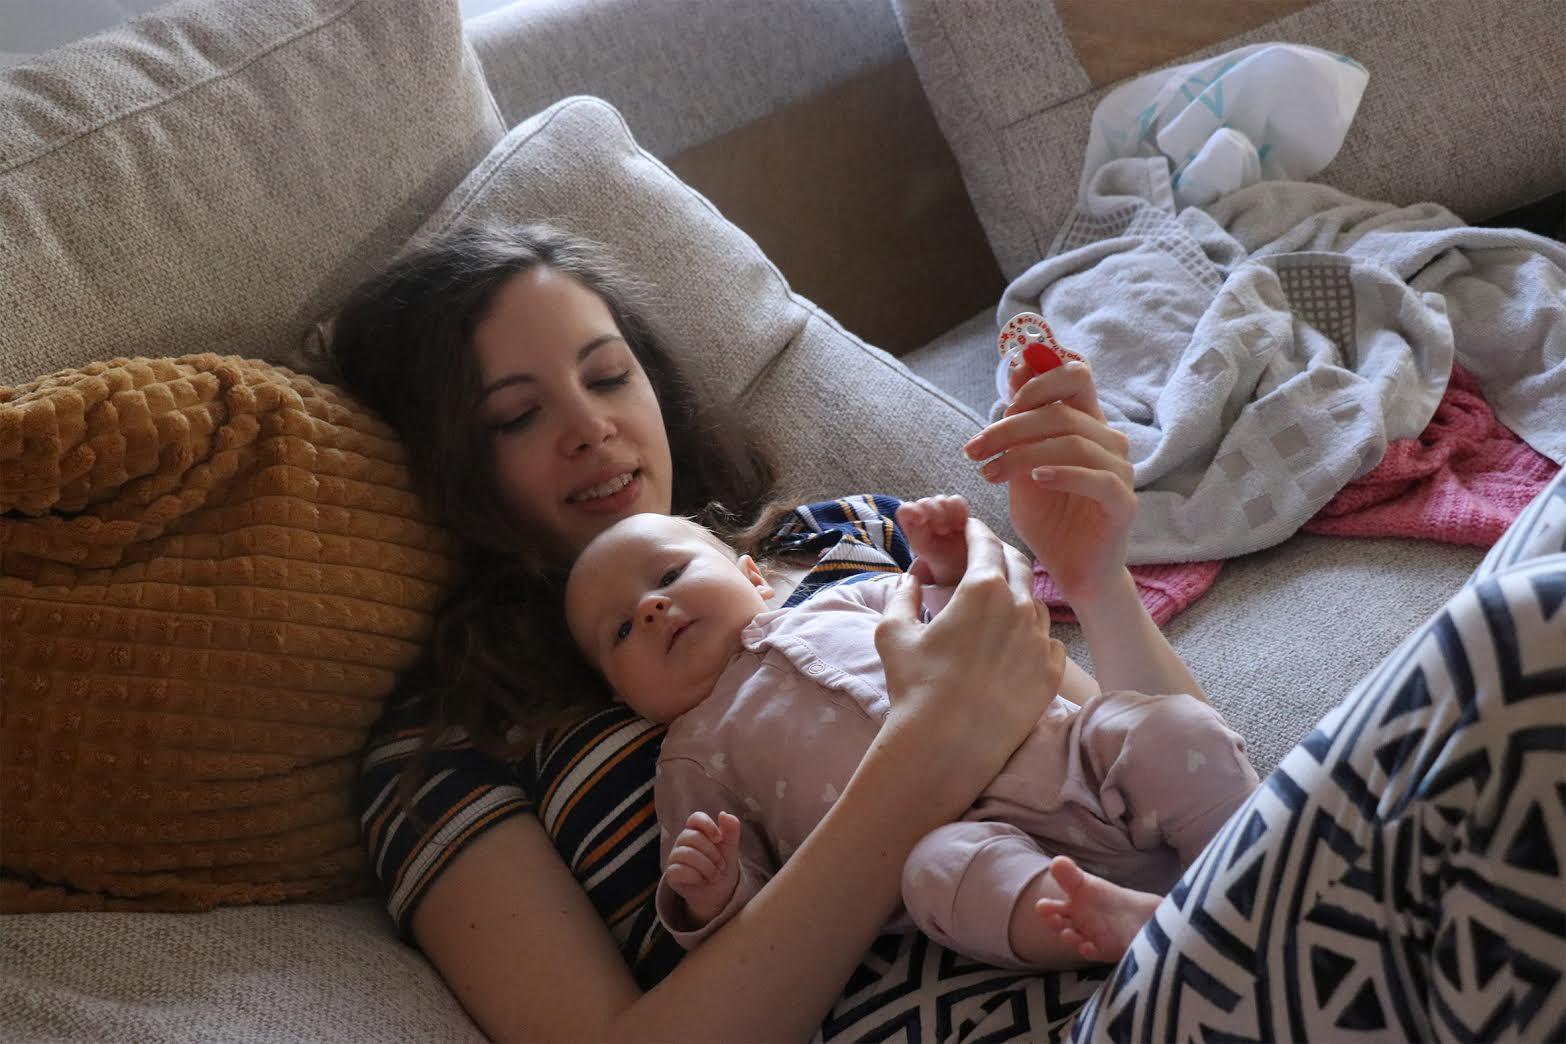 Ann Van den Broeck with her baby